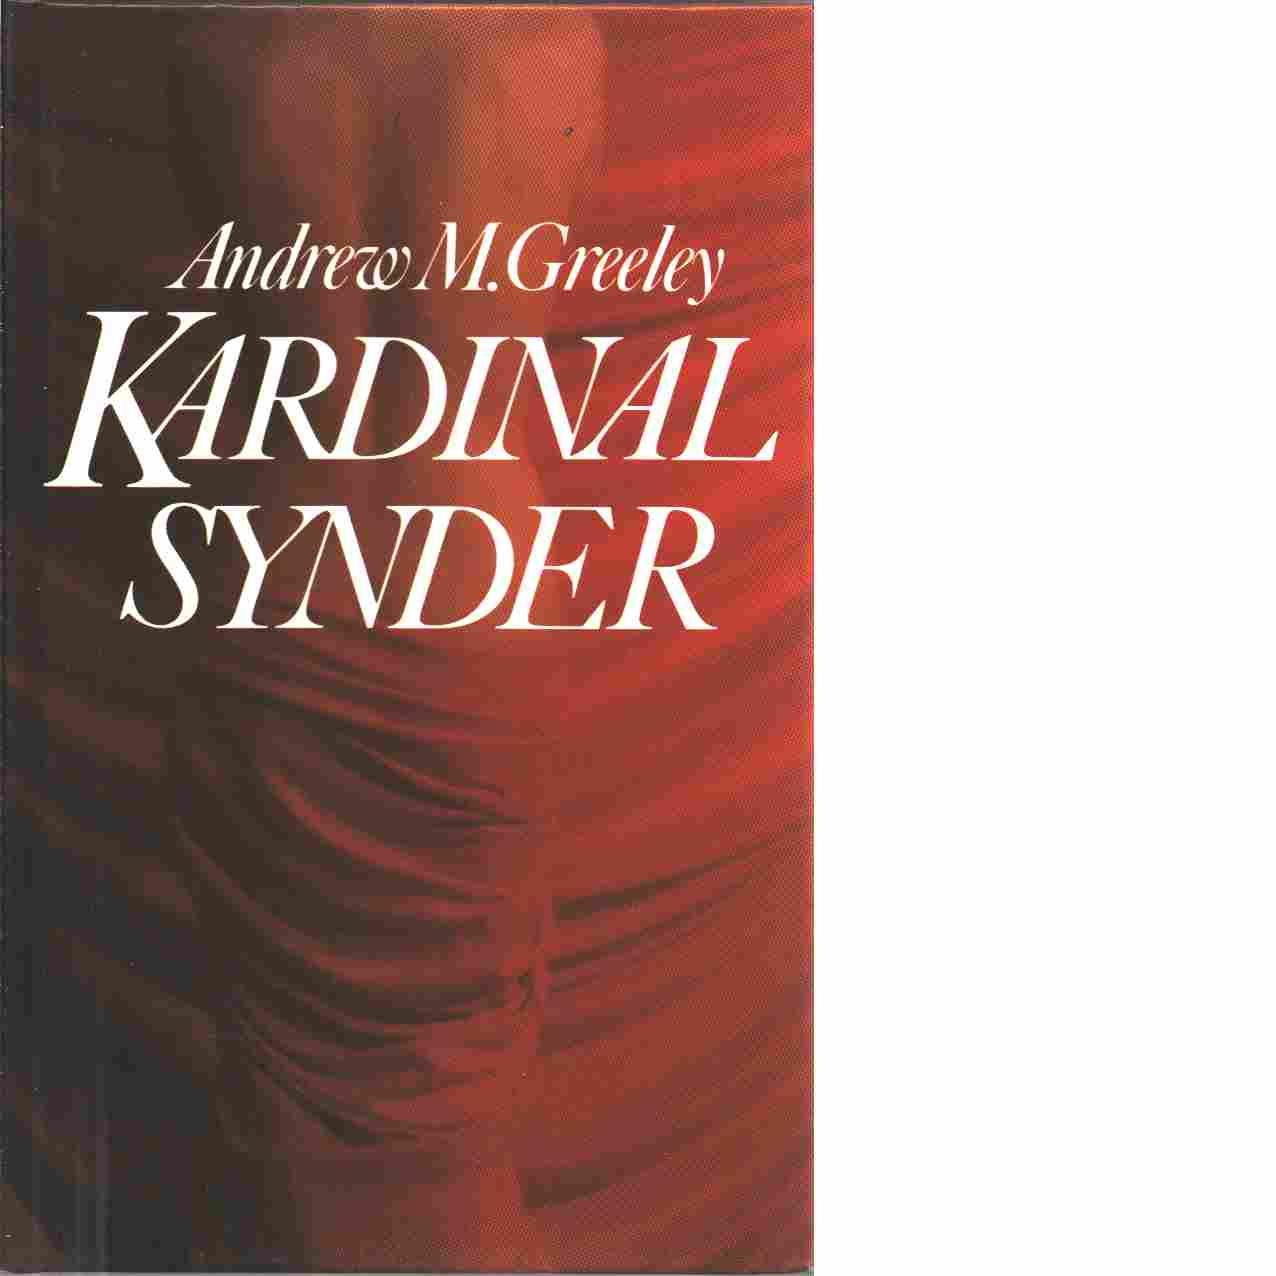 Kardinalsynder - Greeley, Andrew M.